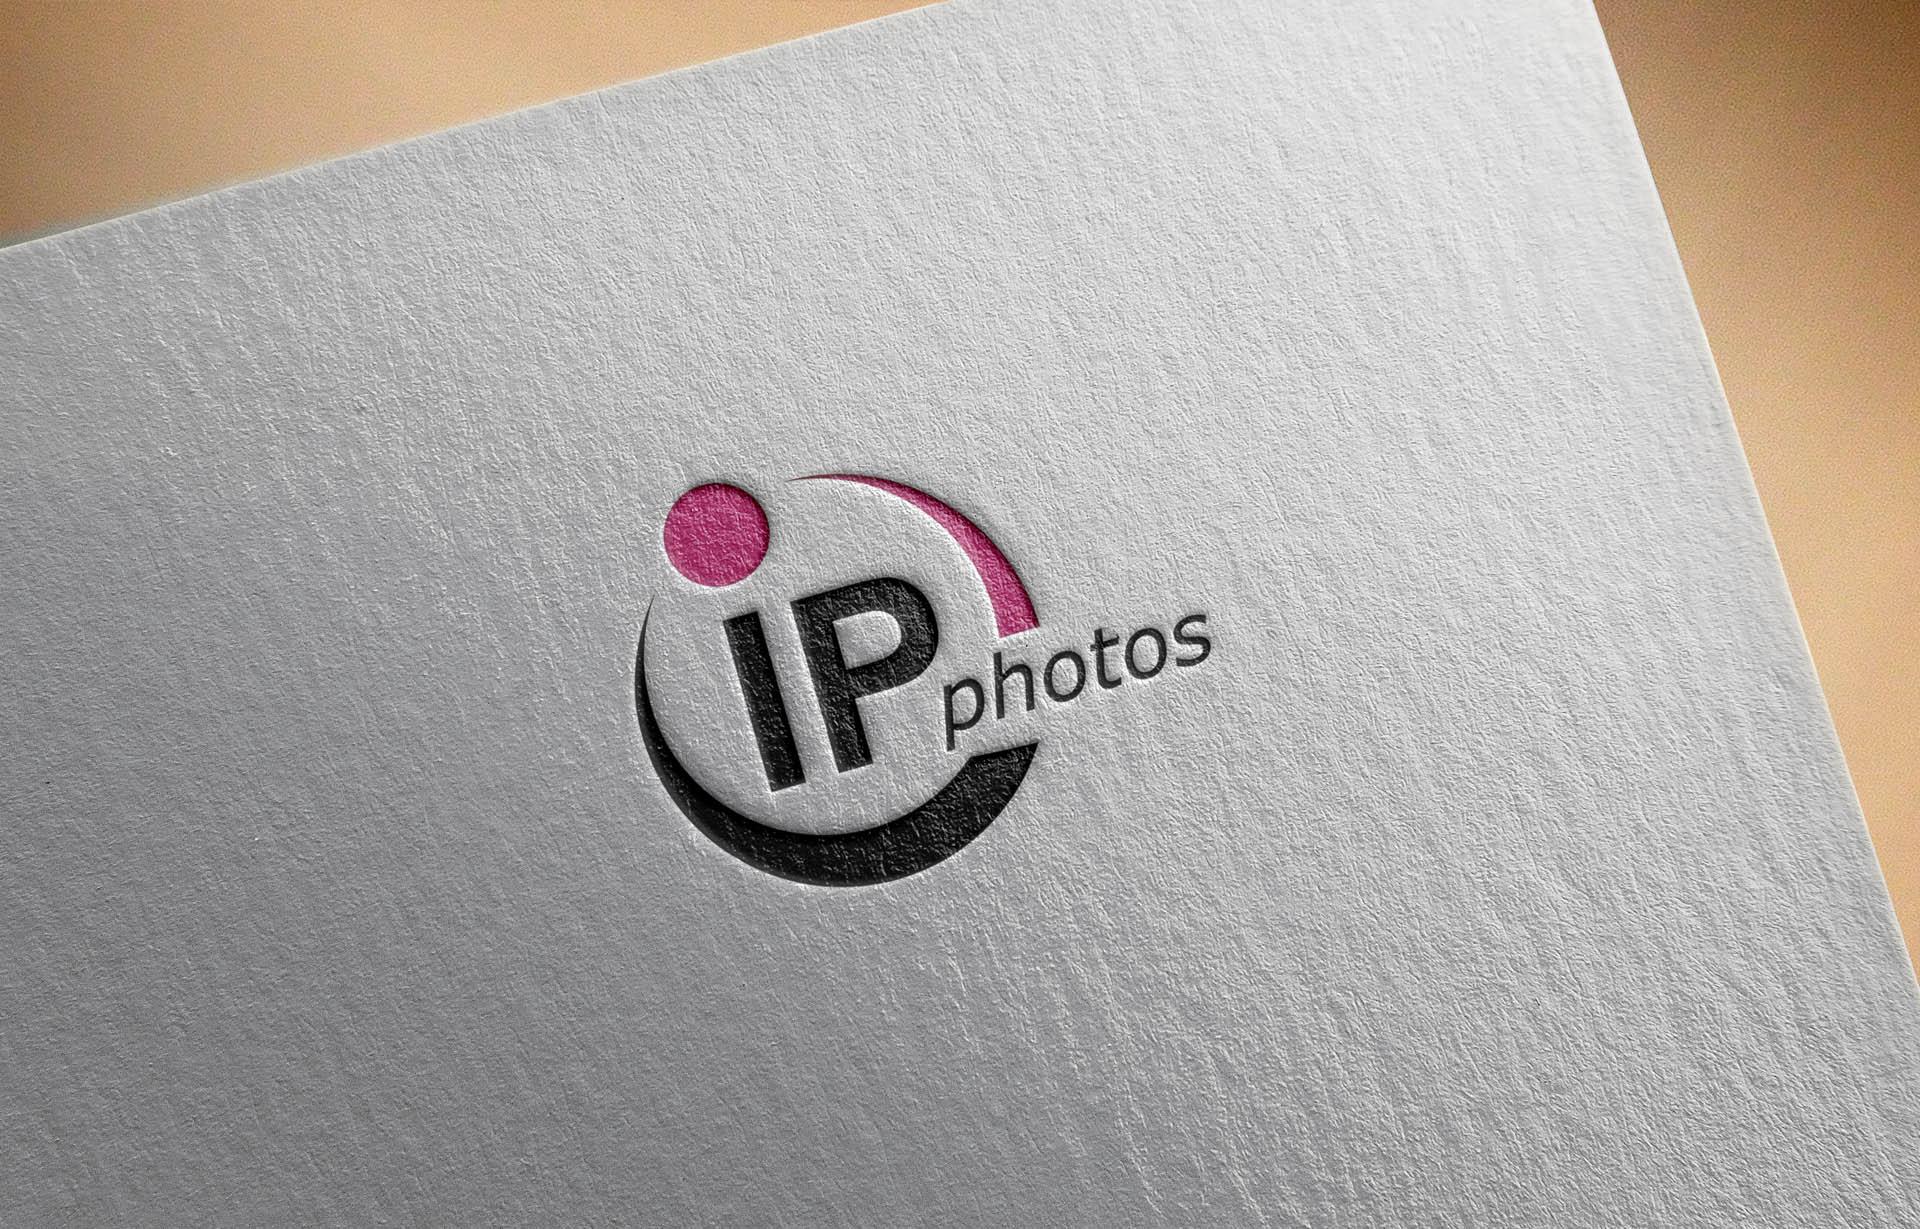 Adatto.cz, tvorba loga - IP Photos